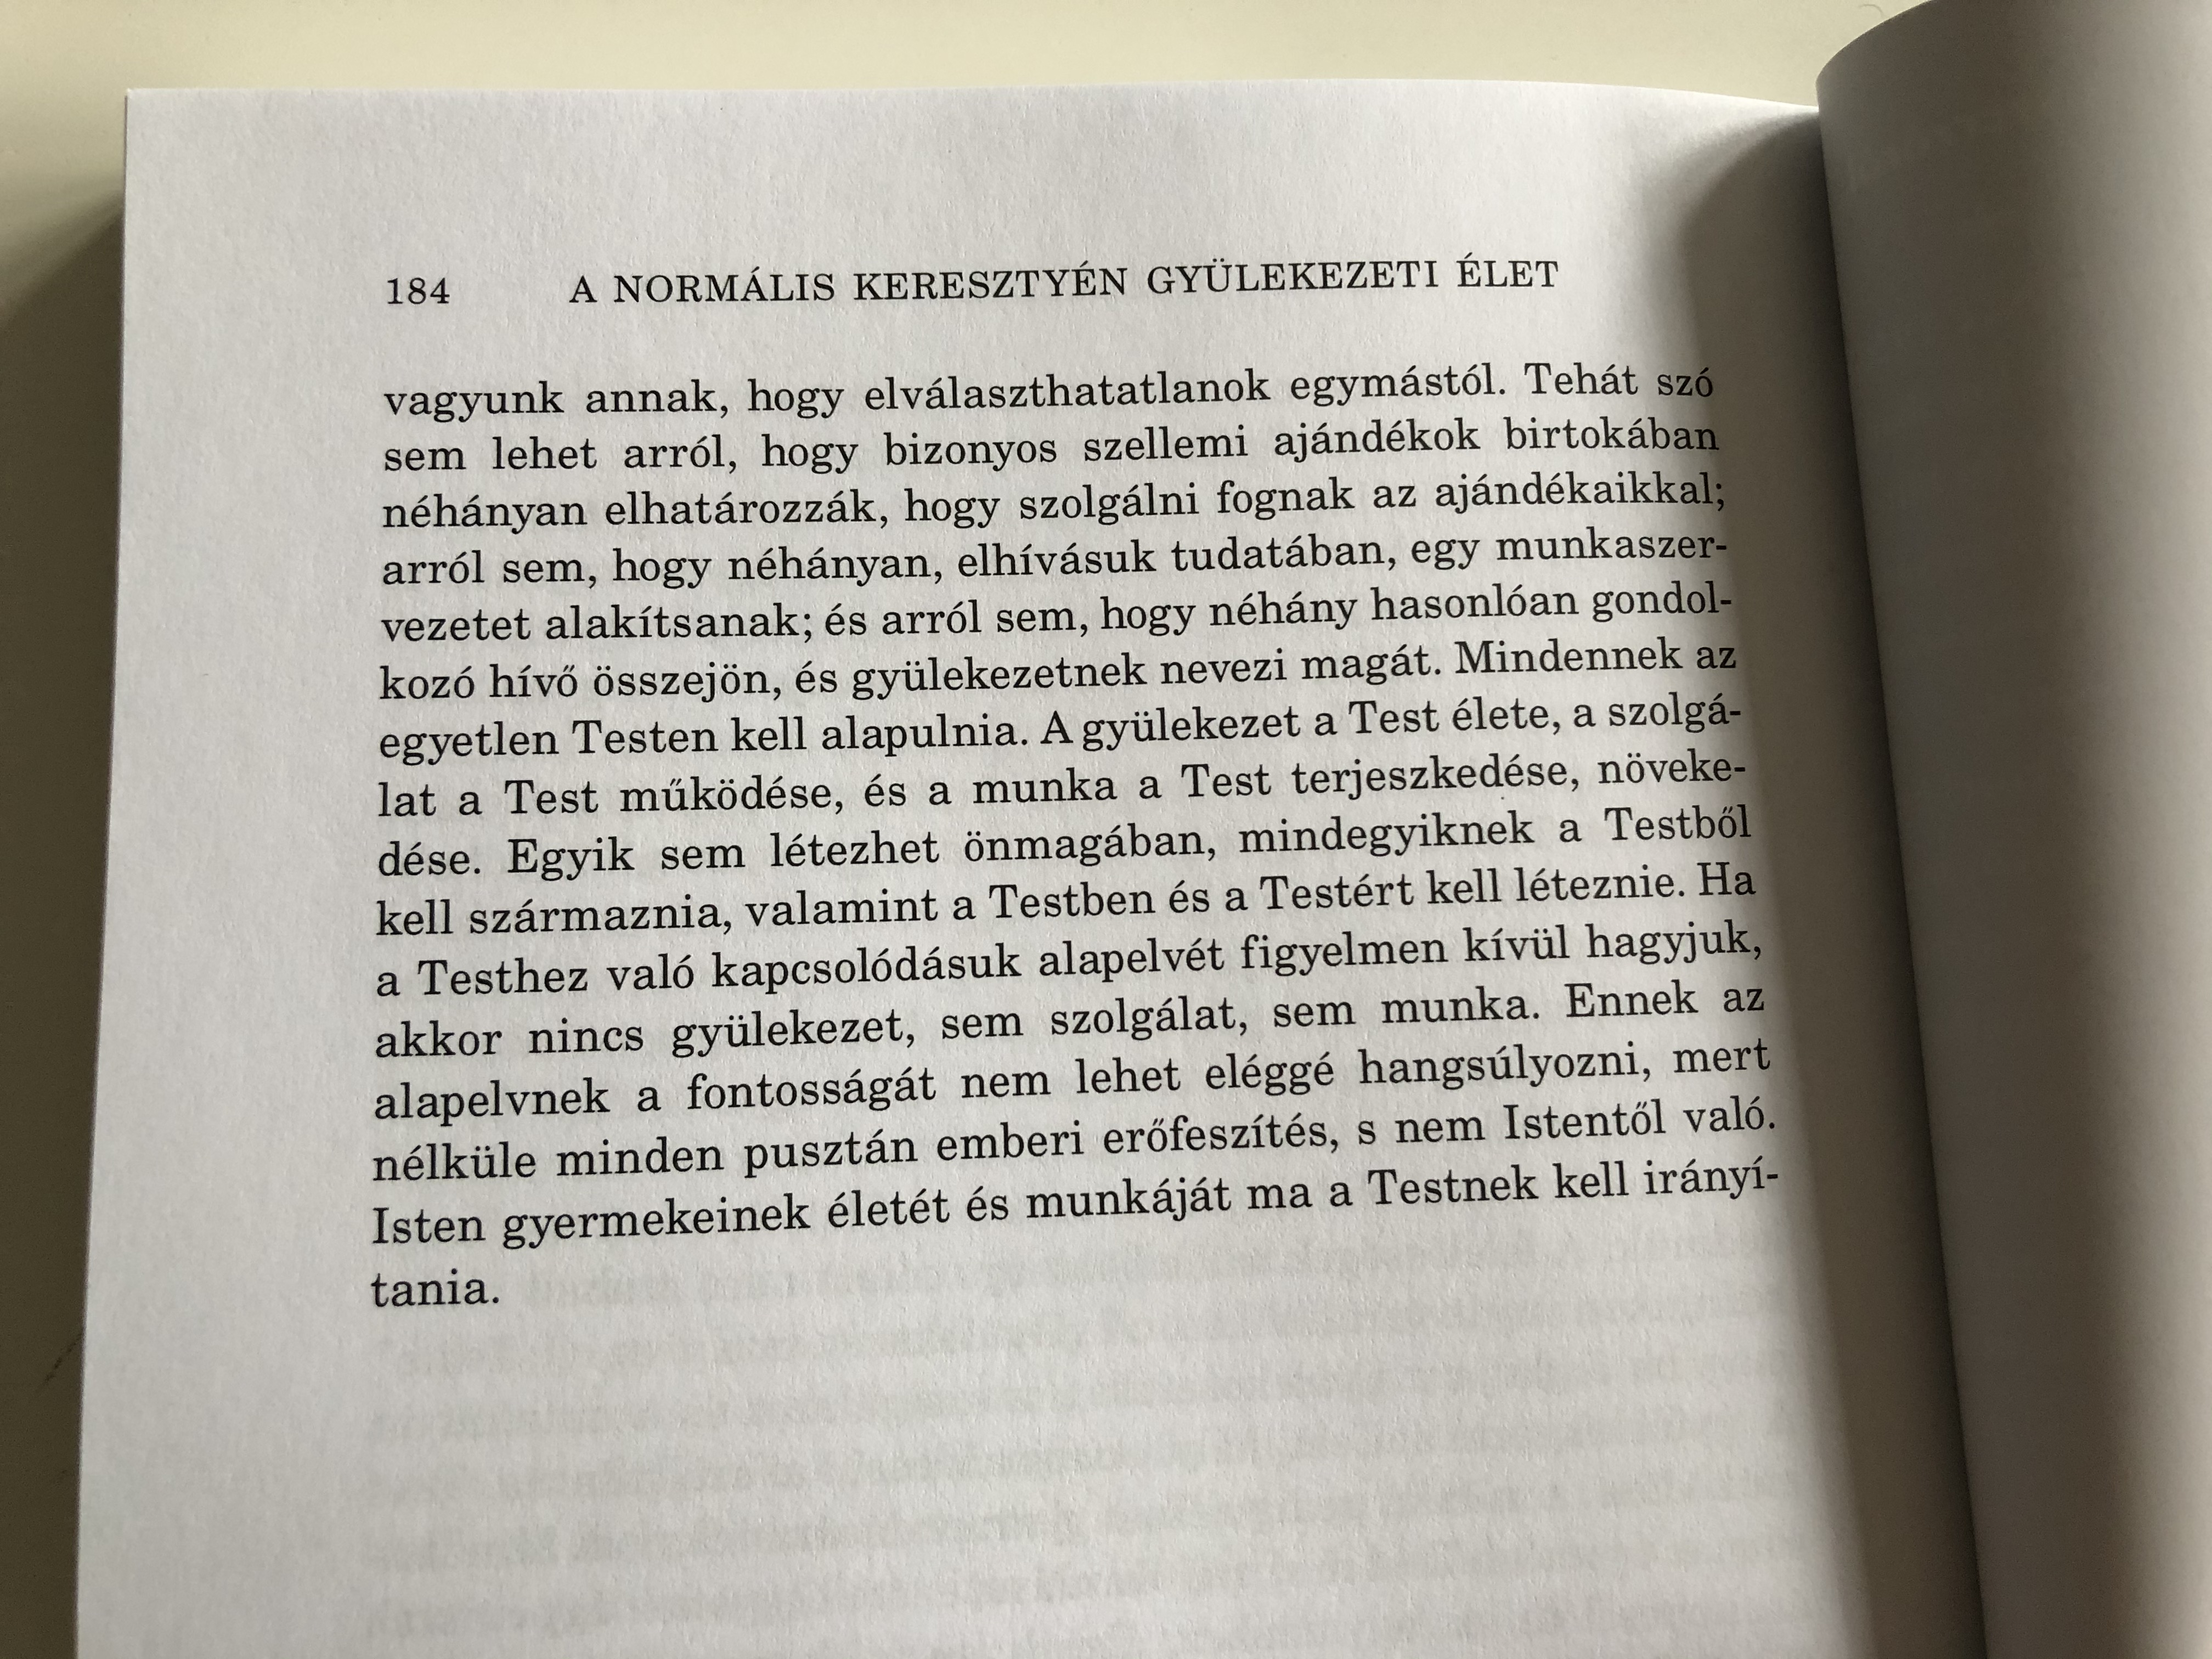 a-norm-lis-kereszty-n-gy-lekezeti-let-by-watchman-nee-the-normal-christian-church-life-in-hungarian-language-8.jpg